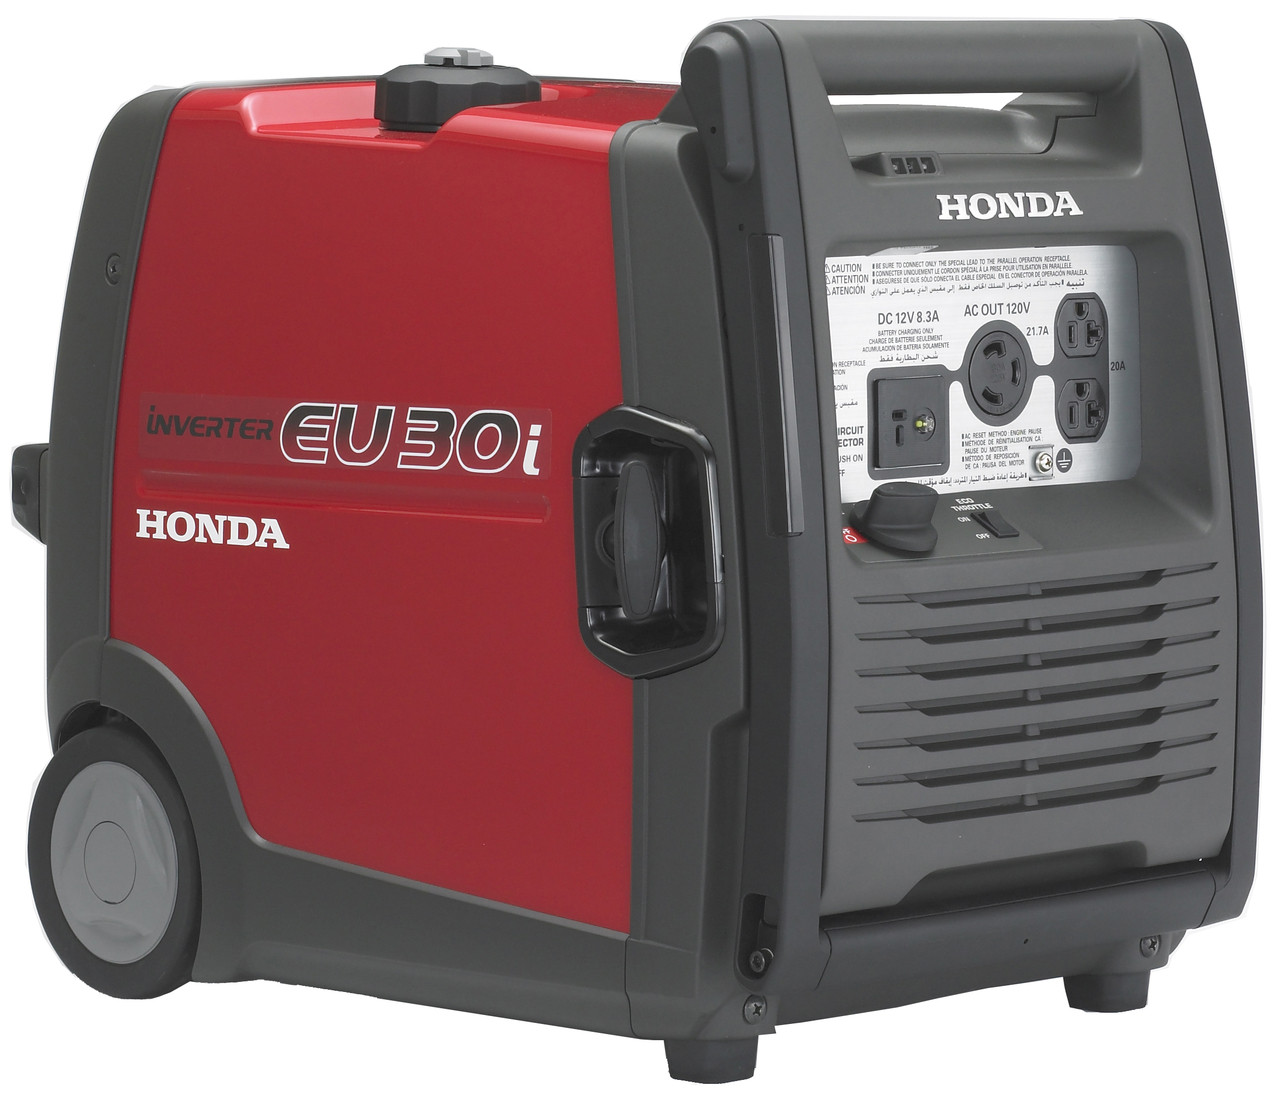 Honda eu30iu handy inverter 3kva generator adelaide dealer for Yamaha inverter generator vs honda